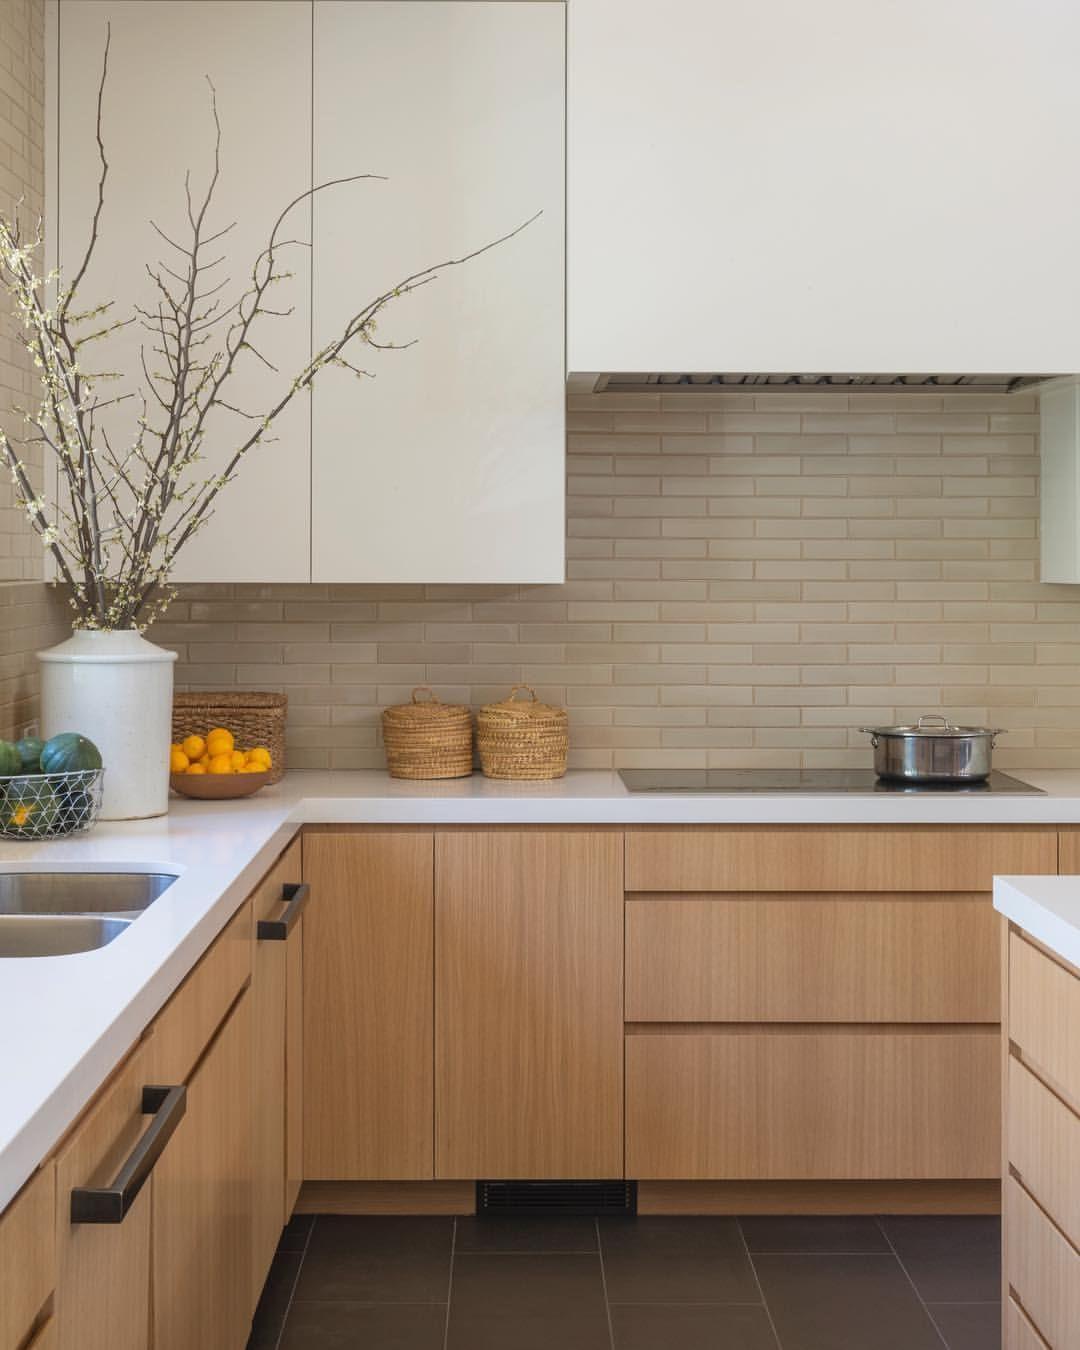 Kitchen By Disc Interiors Discinteriors Modernkitchen Interiordesign Interiordesigner Kitchend Kitchen Trends Modern Kitchen Design Modern Wooden Kitchen